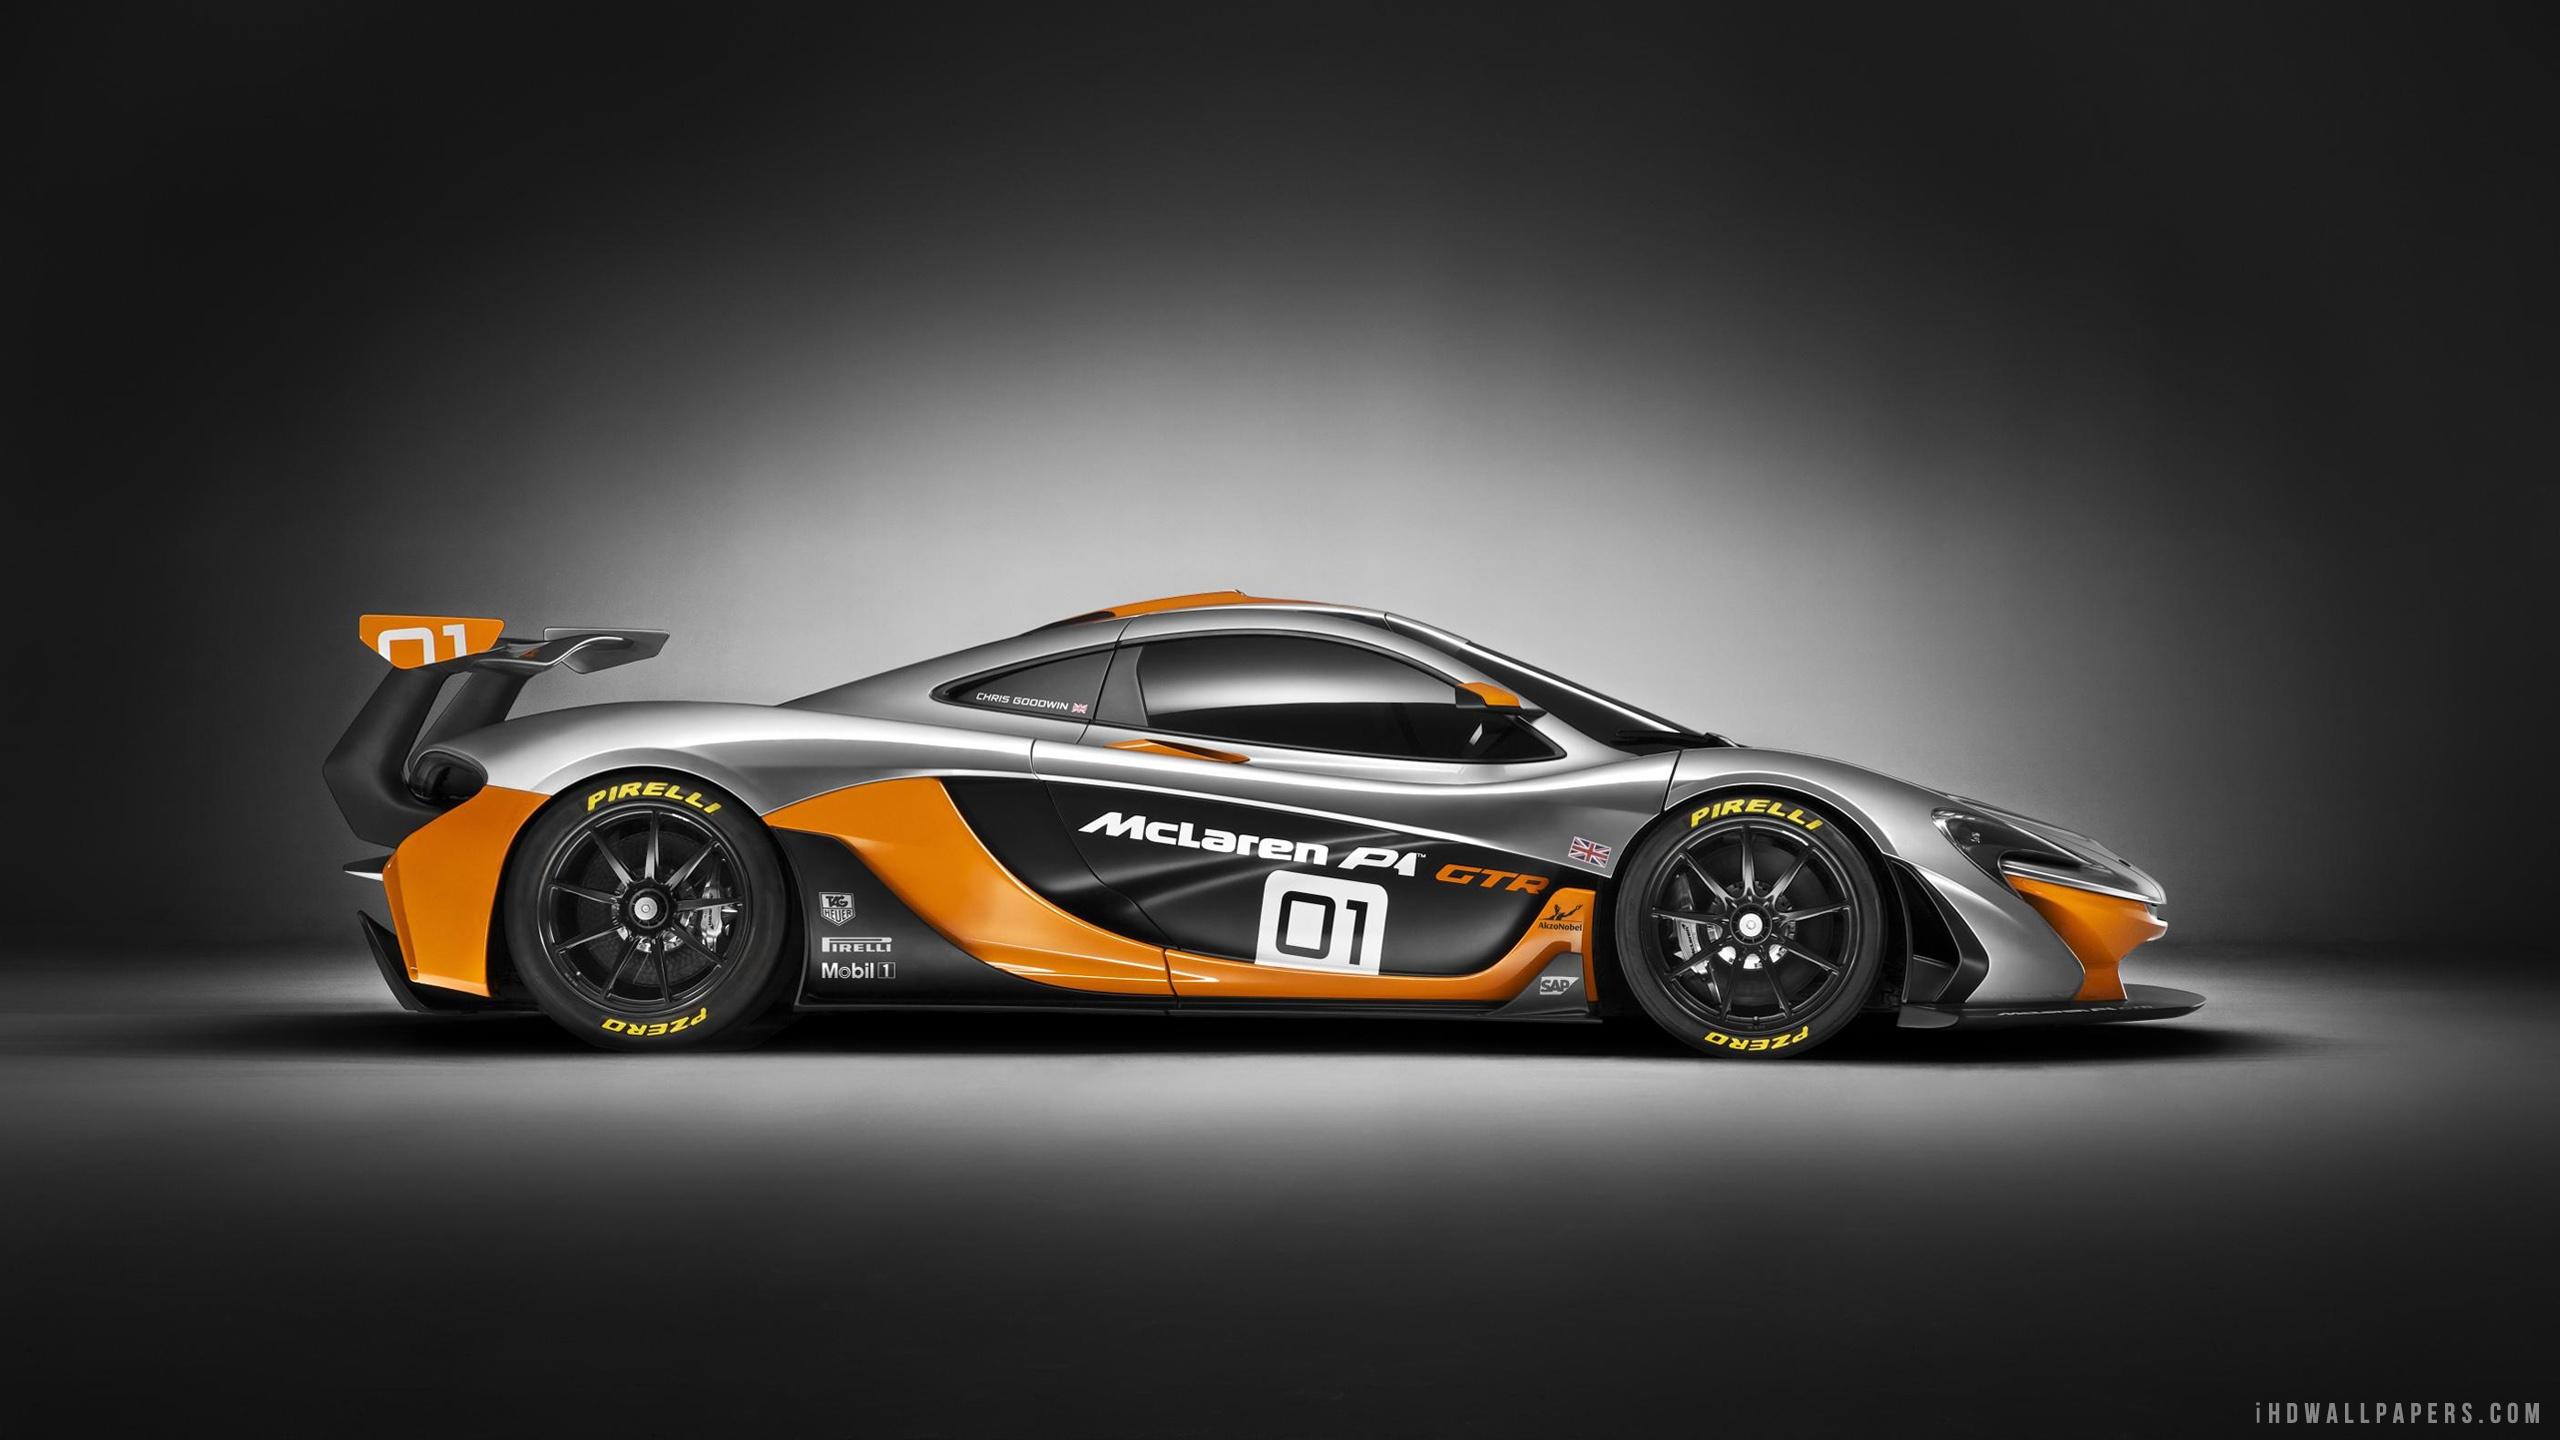 McLaren P1 GTR Wallpaper 2560x1440